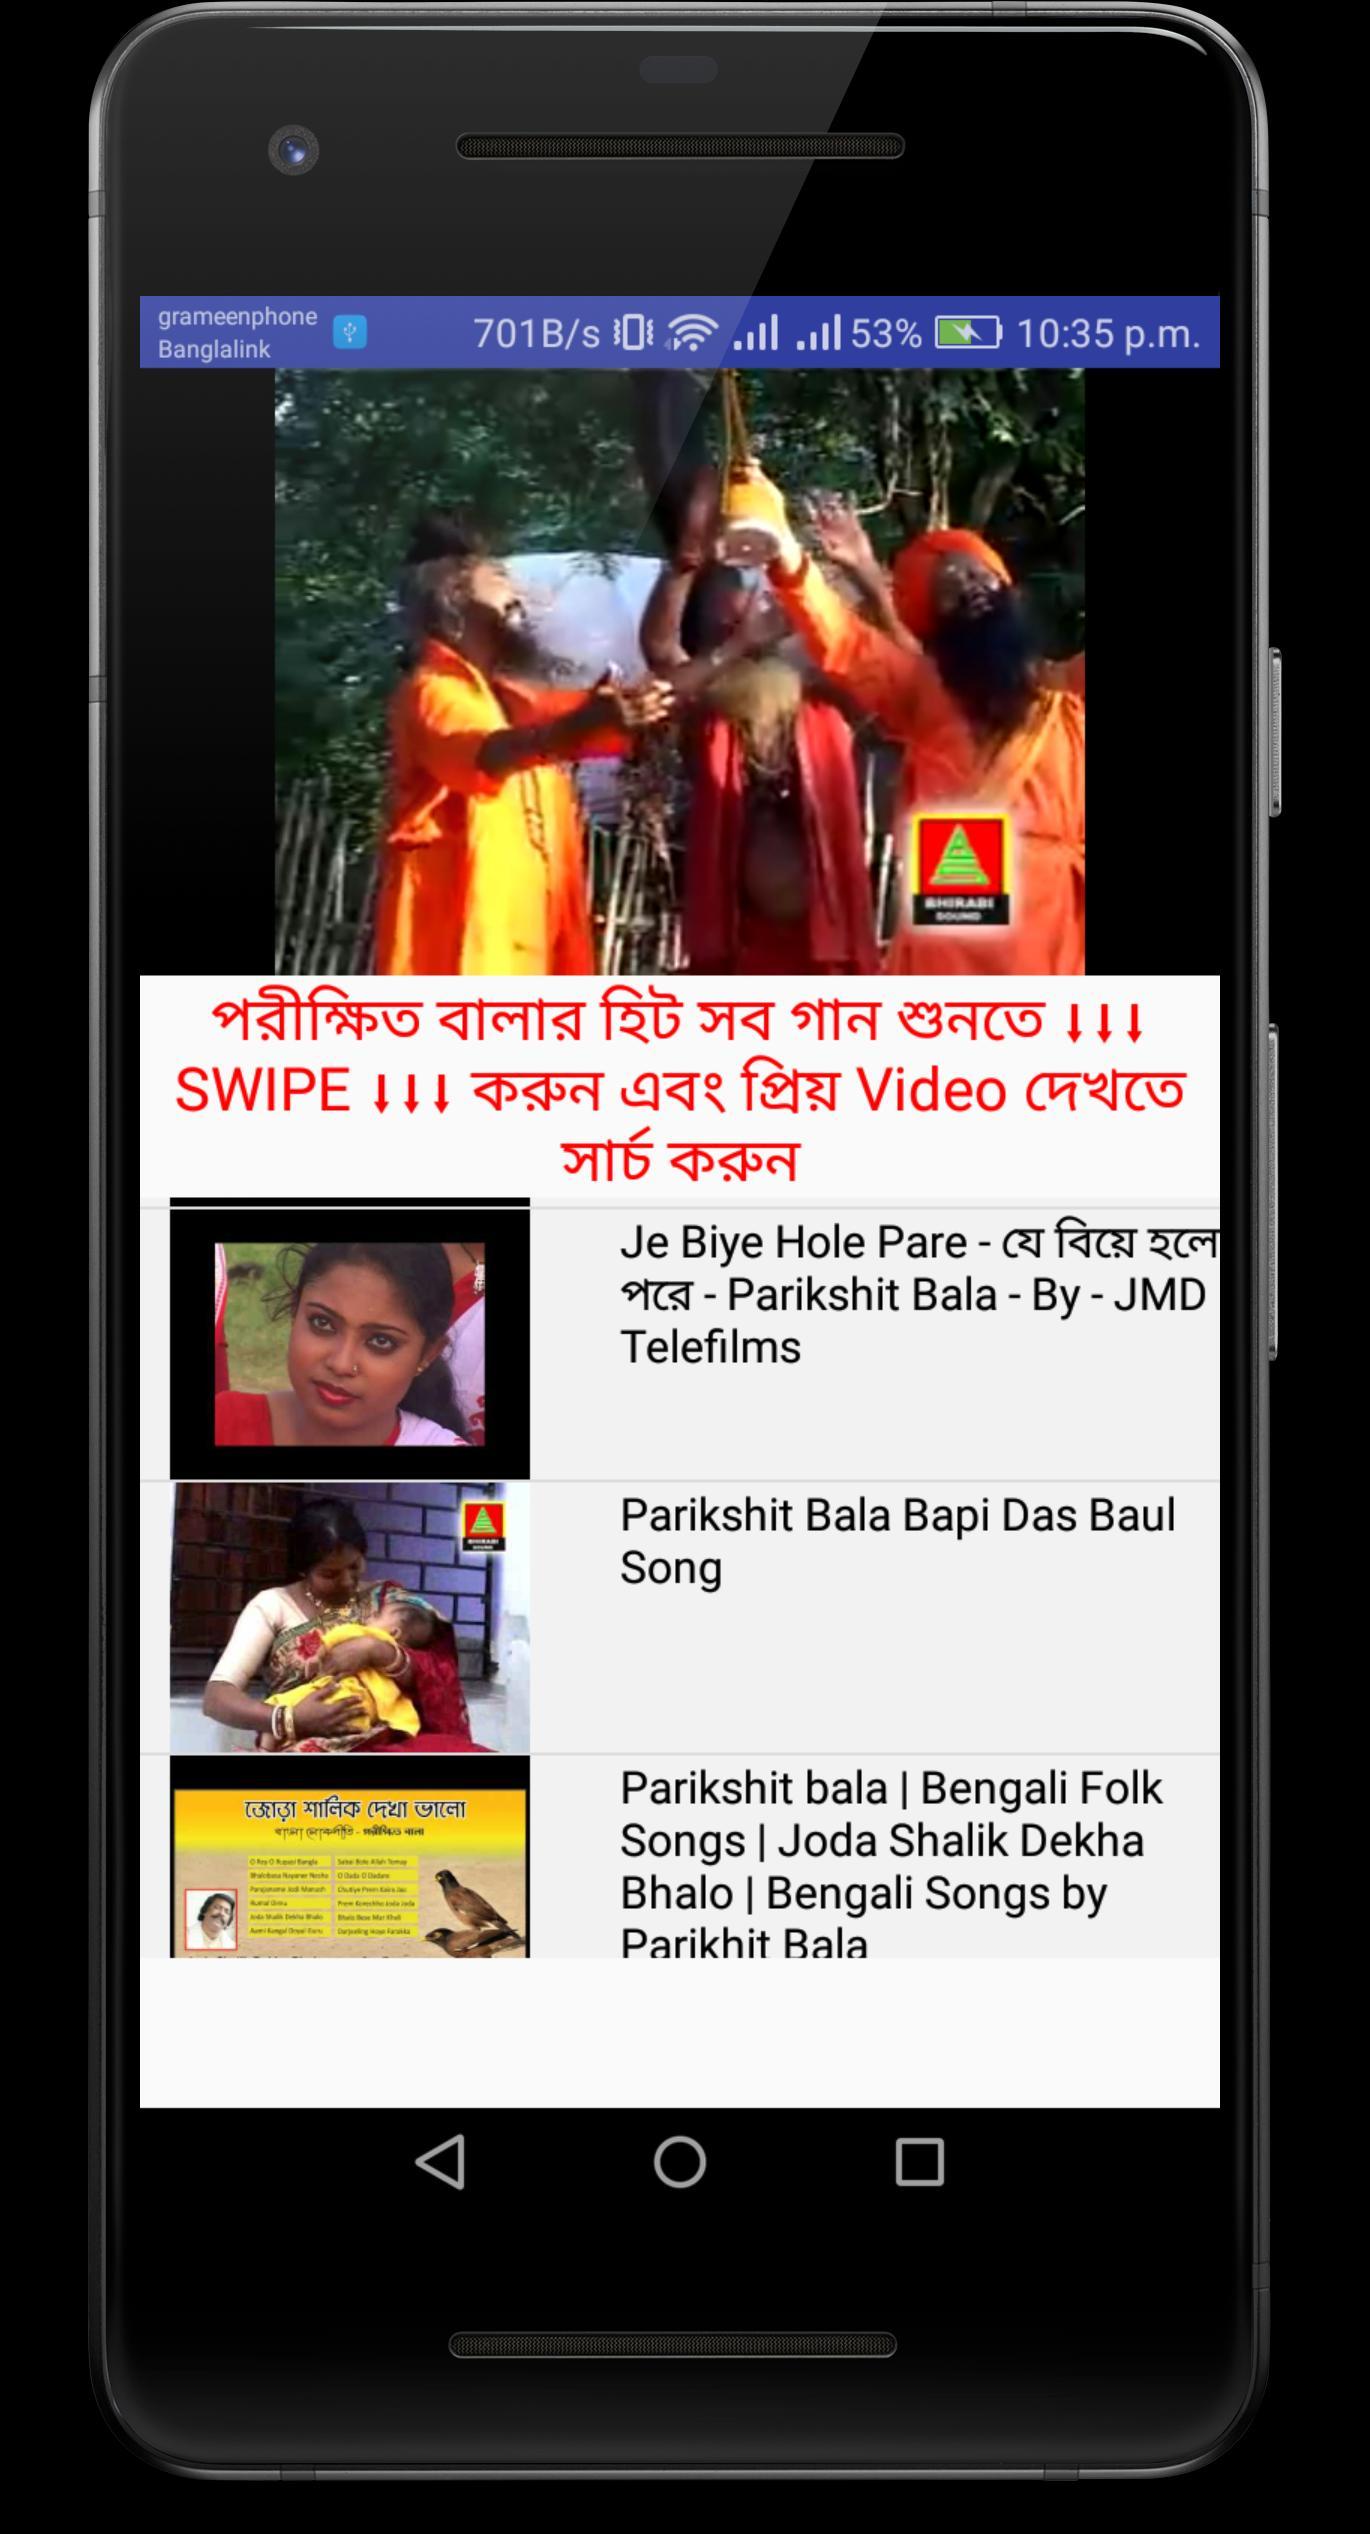 Baul Song Parikshit Bala Anti Feixista